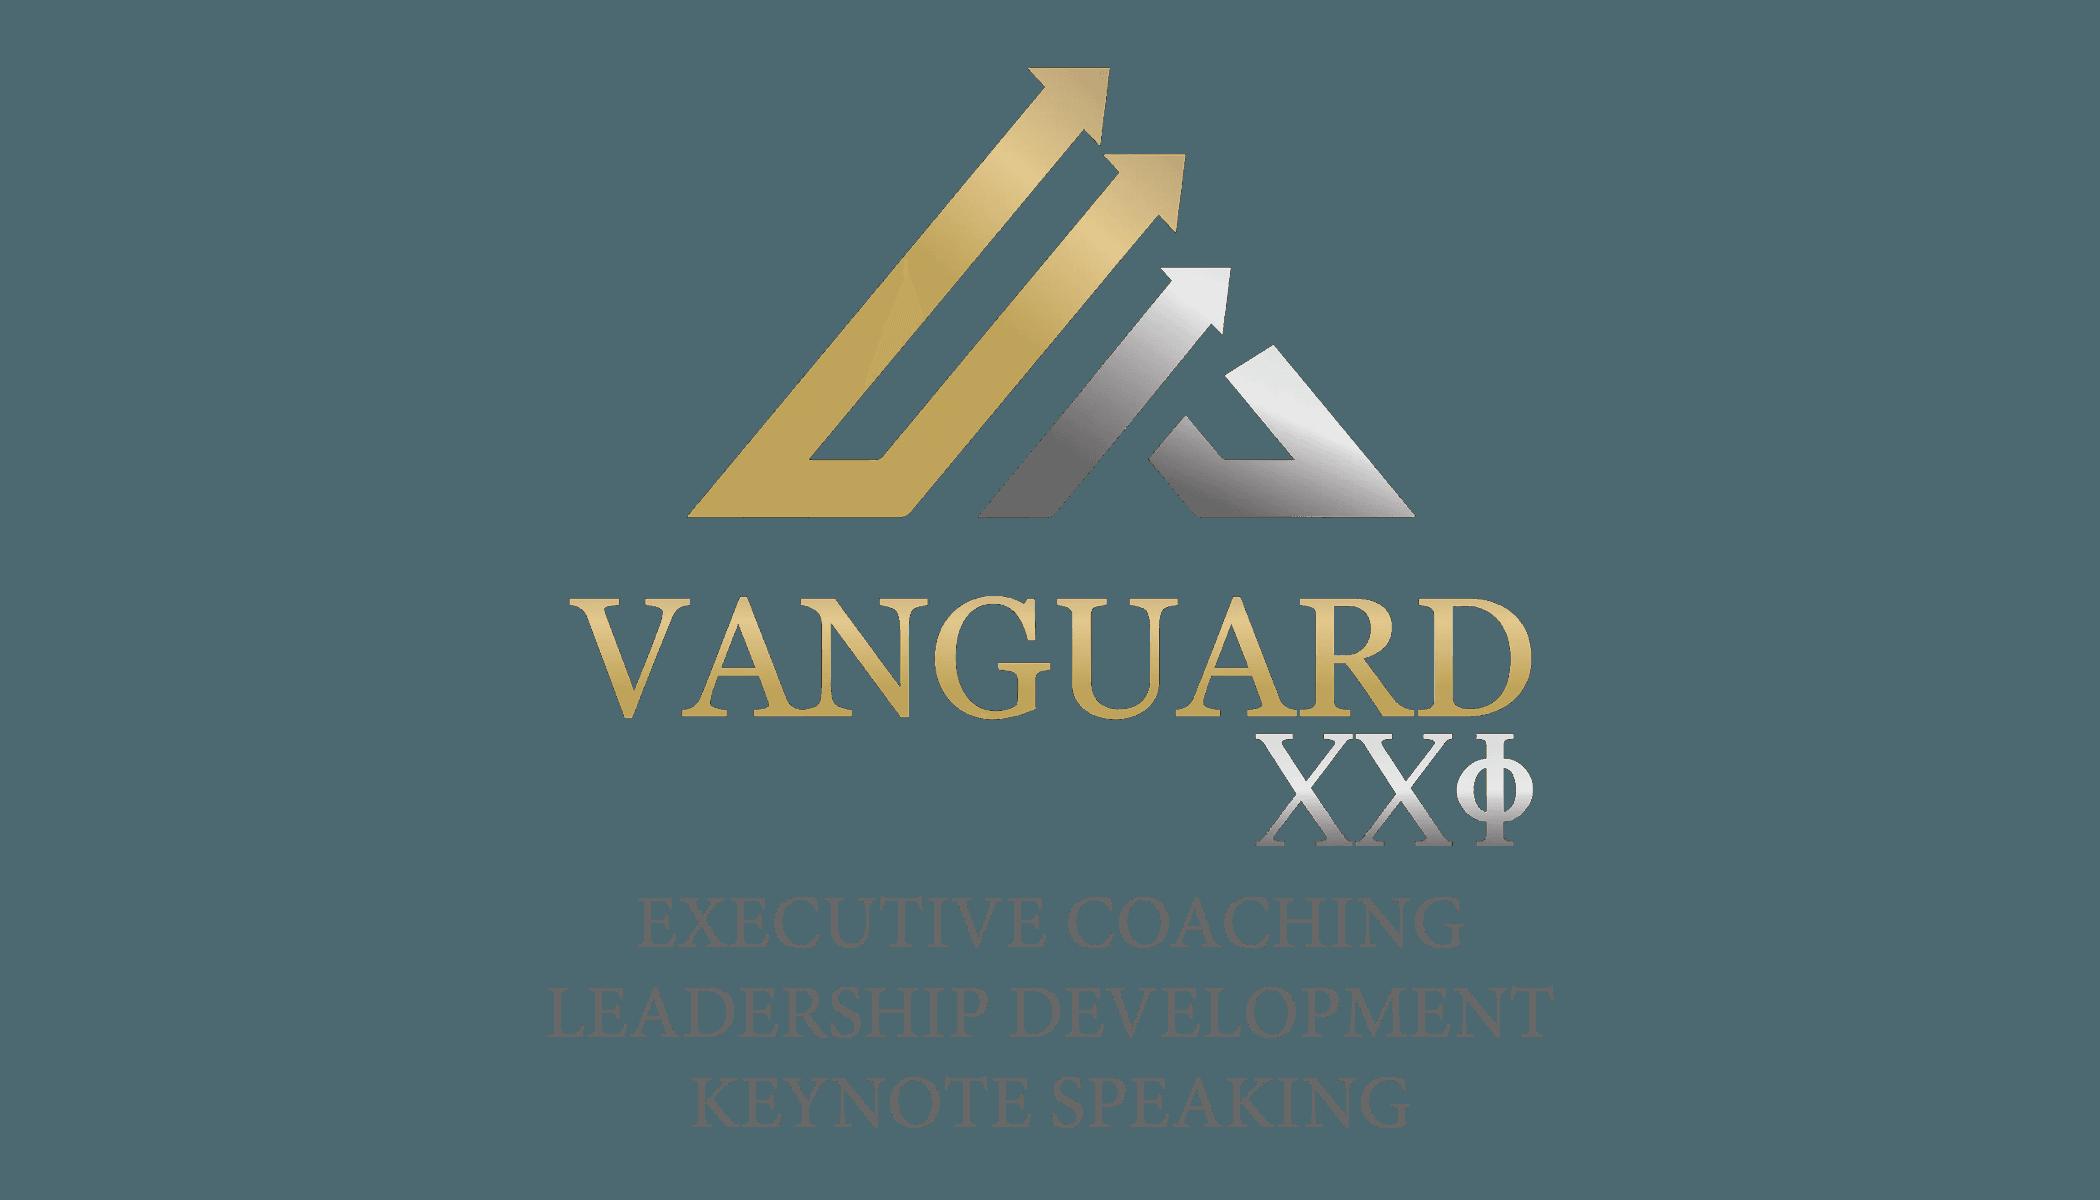 https://vanguardxxi.com